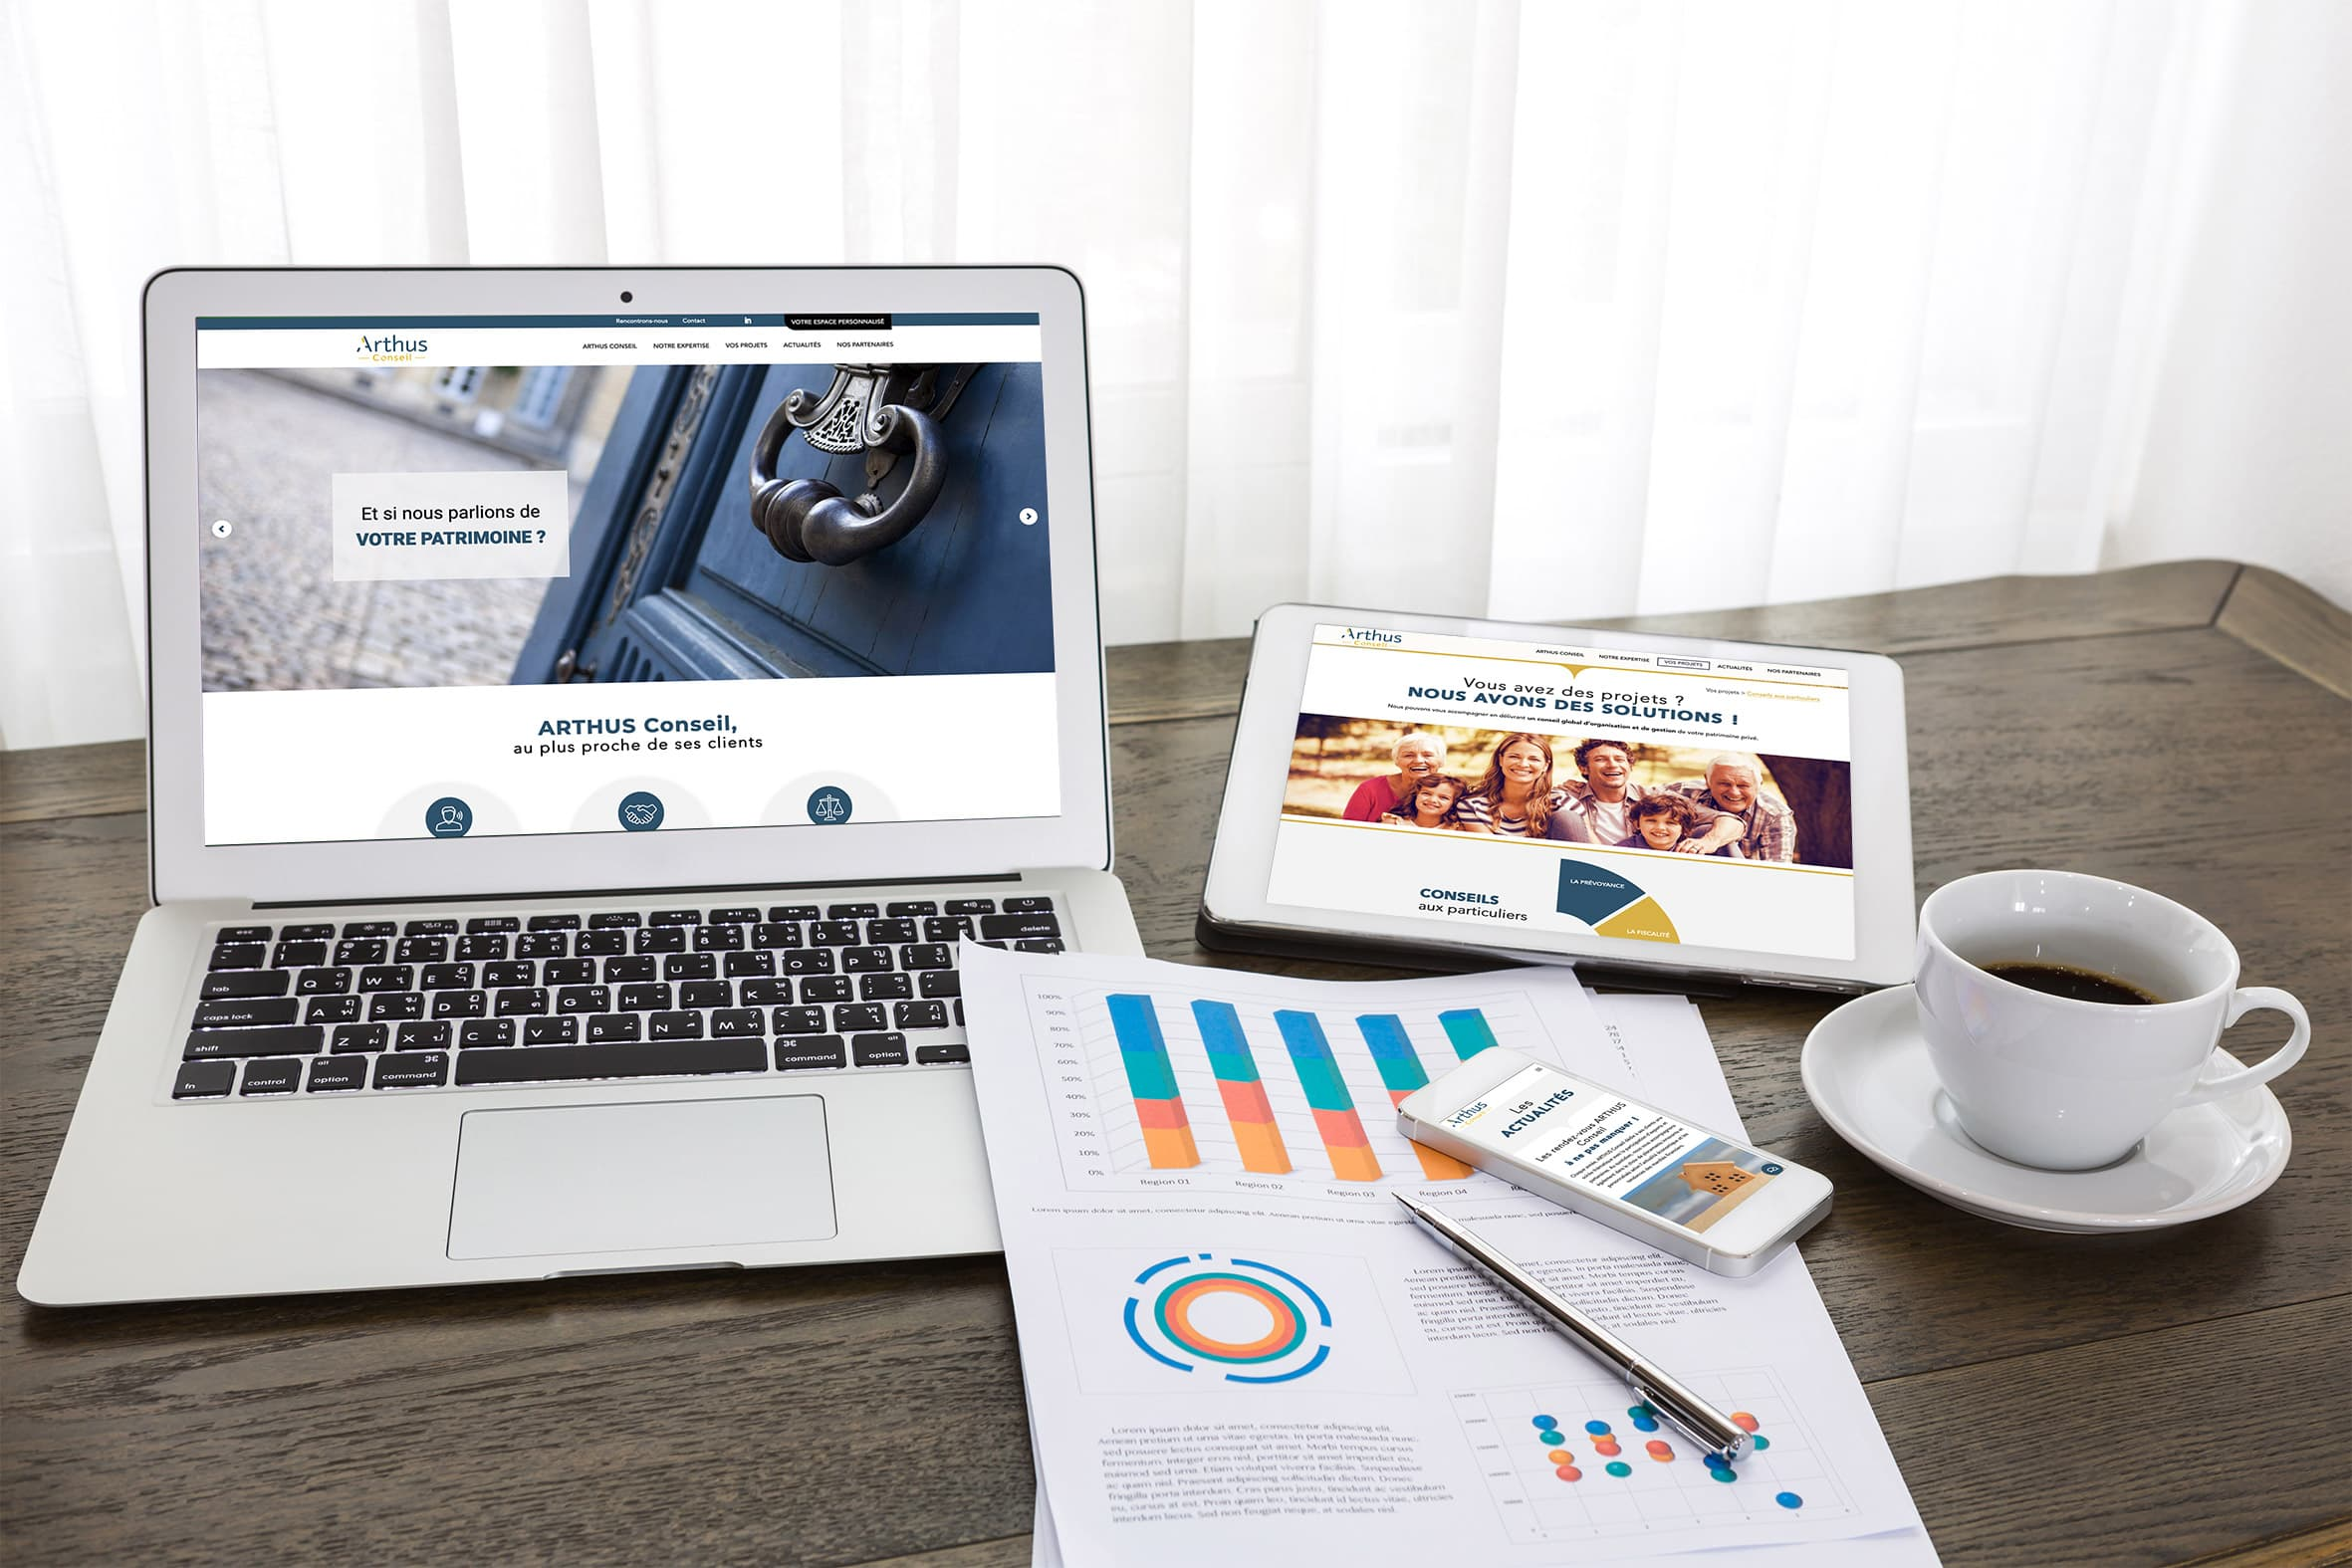 eclolink_agence_webmarketing_client_dijon_Arthus-conseil_site